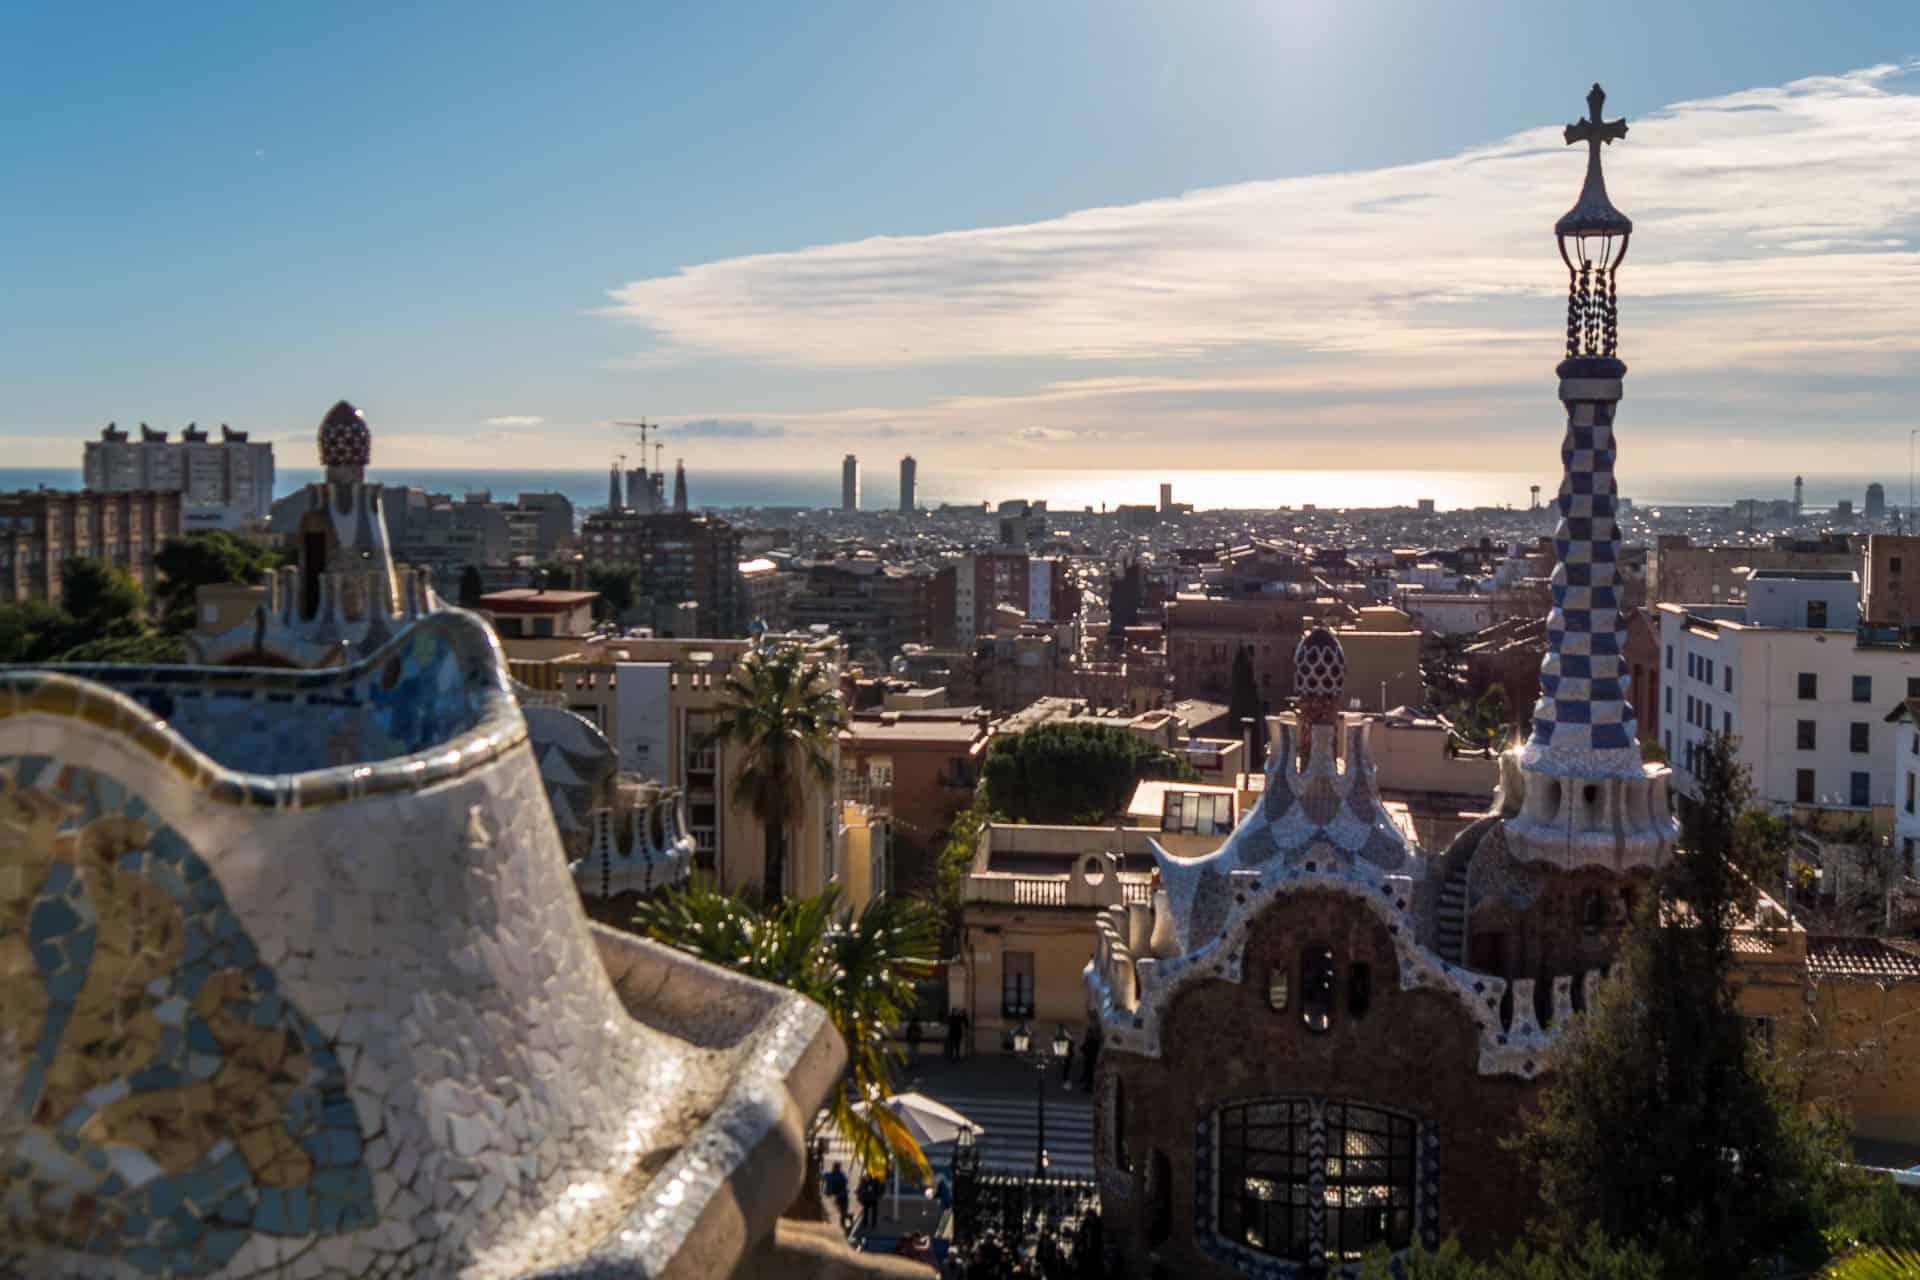 must-see-gaudi-building-park-guell-obras-imperdíveis-de-Gaudí